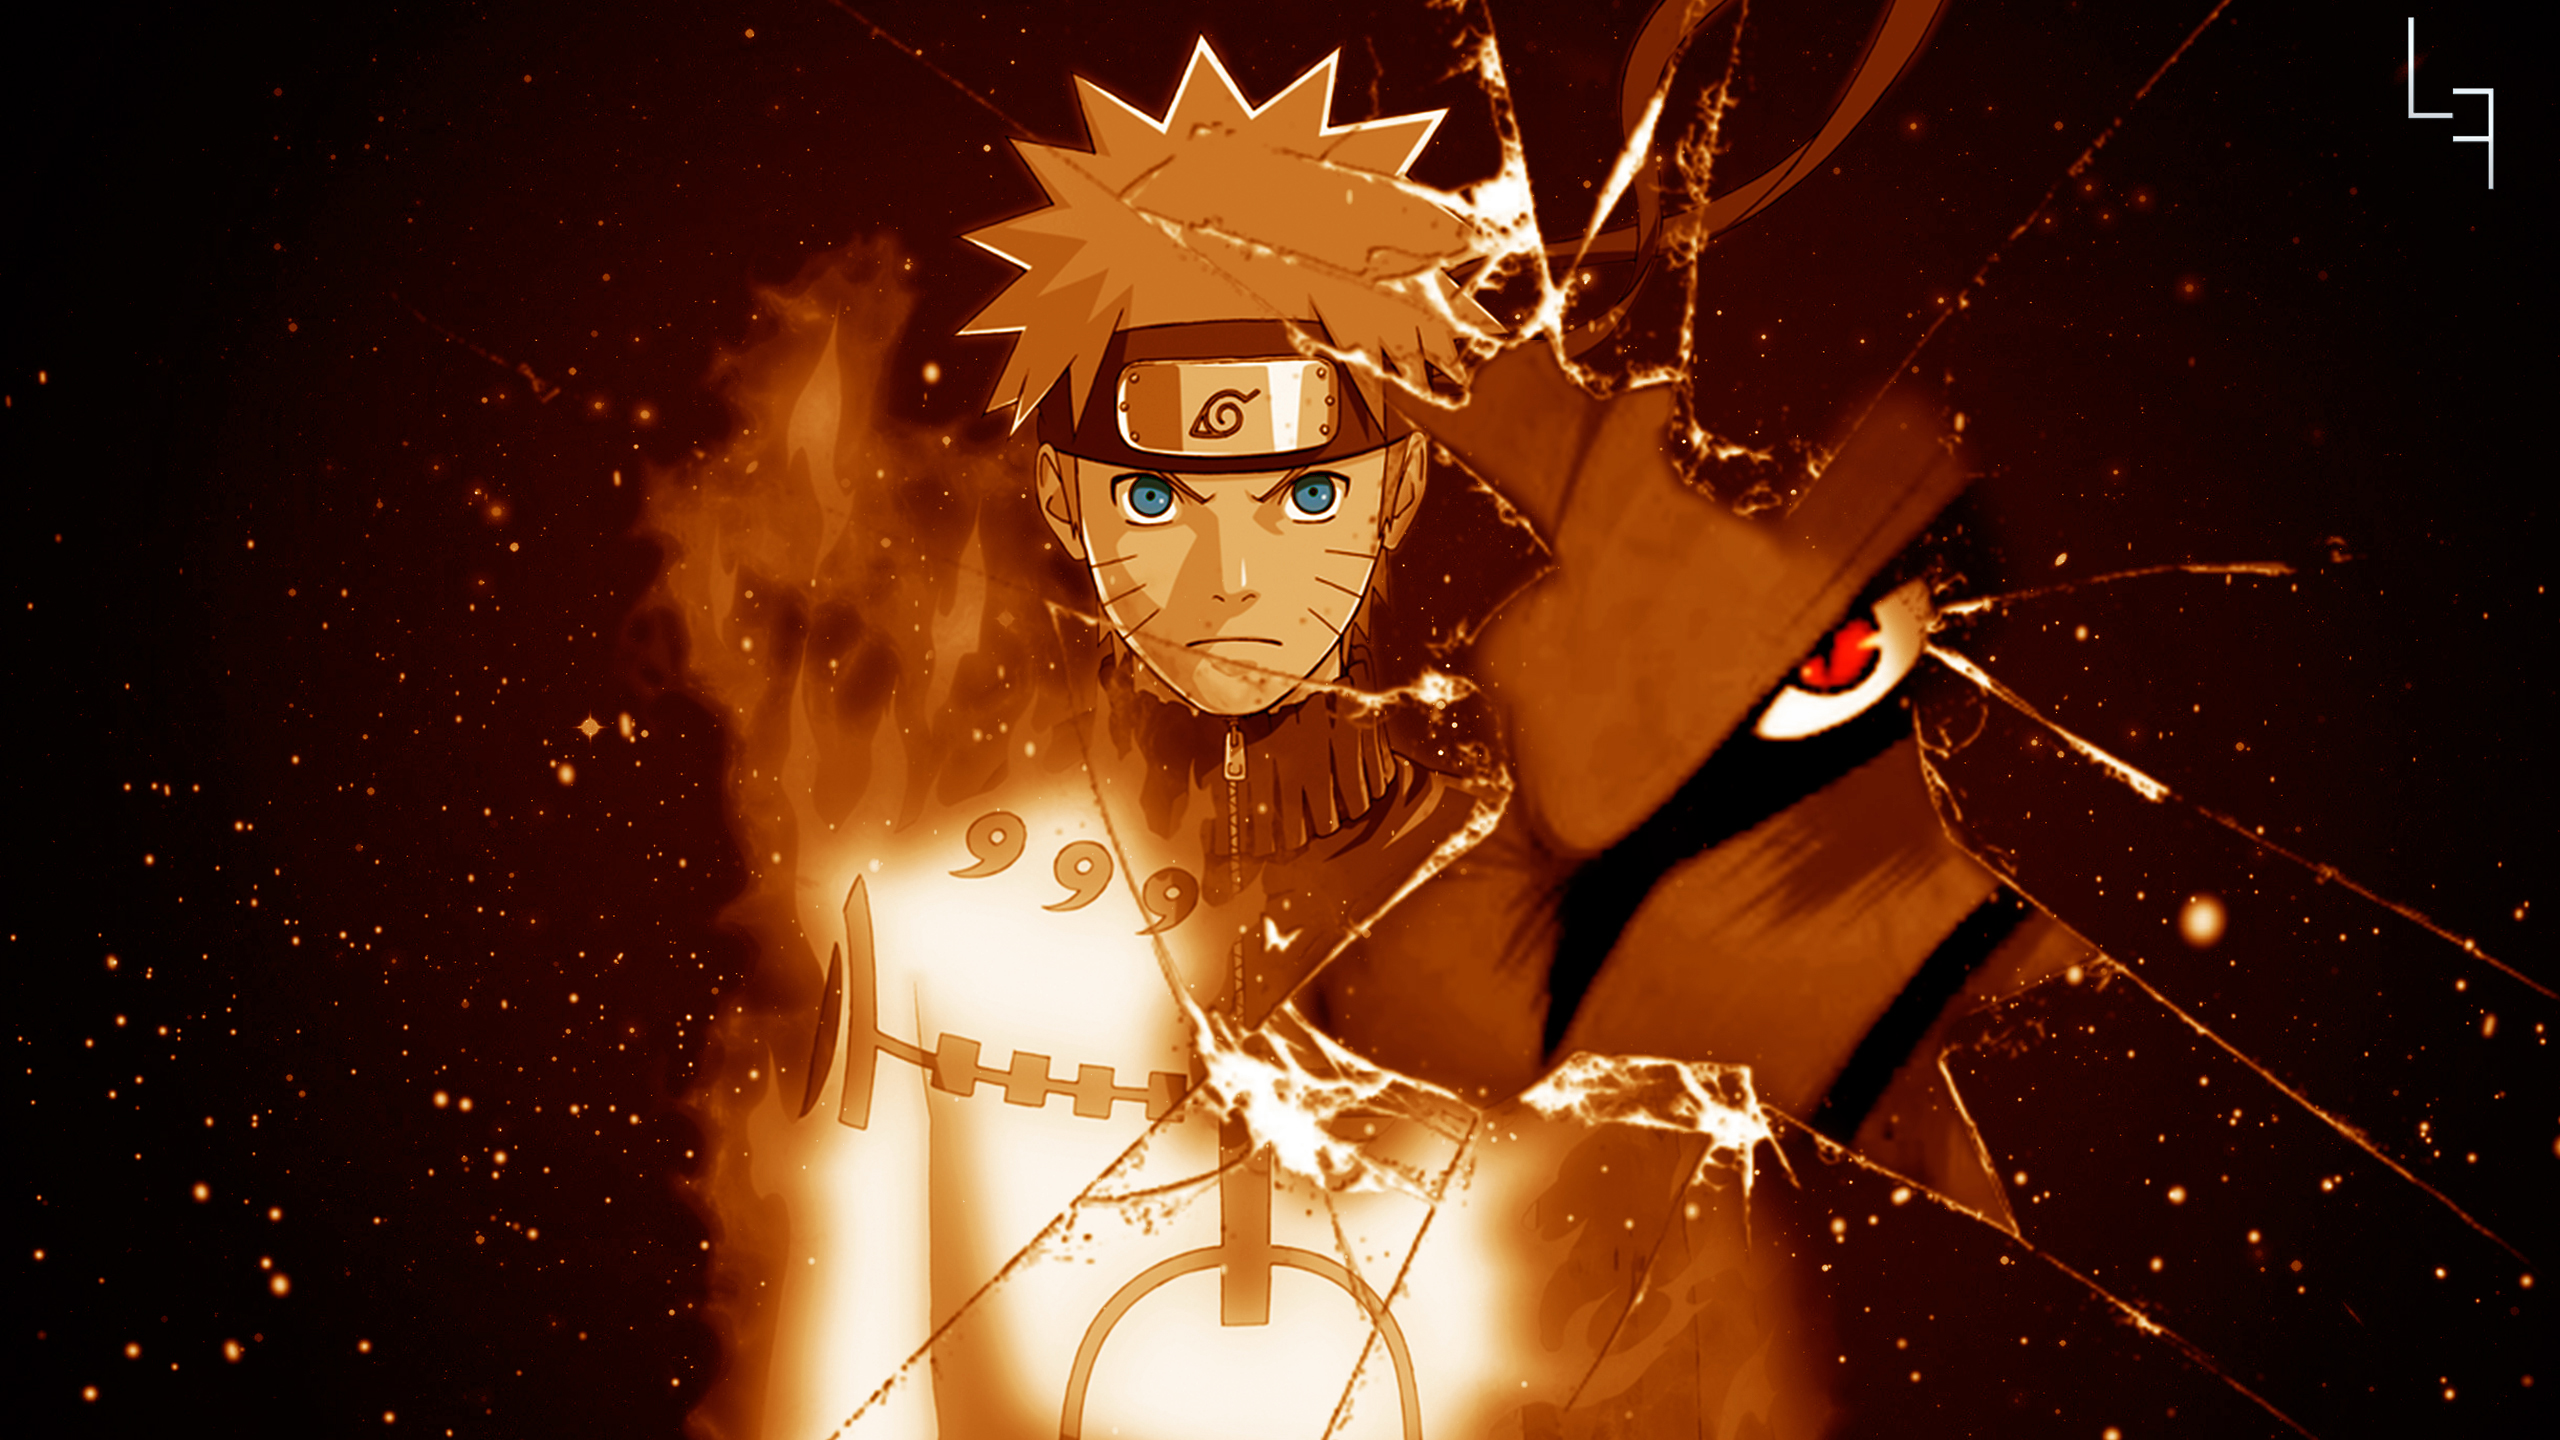 Naruto HD Wallpaper | Background Image | 2560x1440 | ID ...